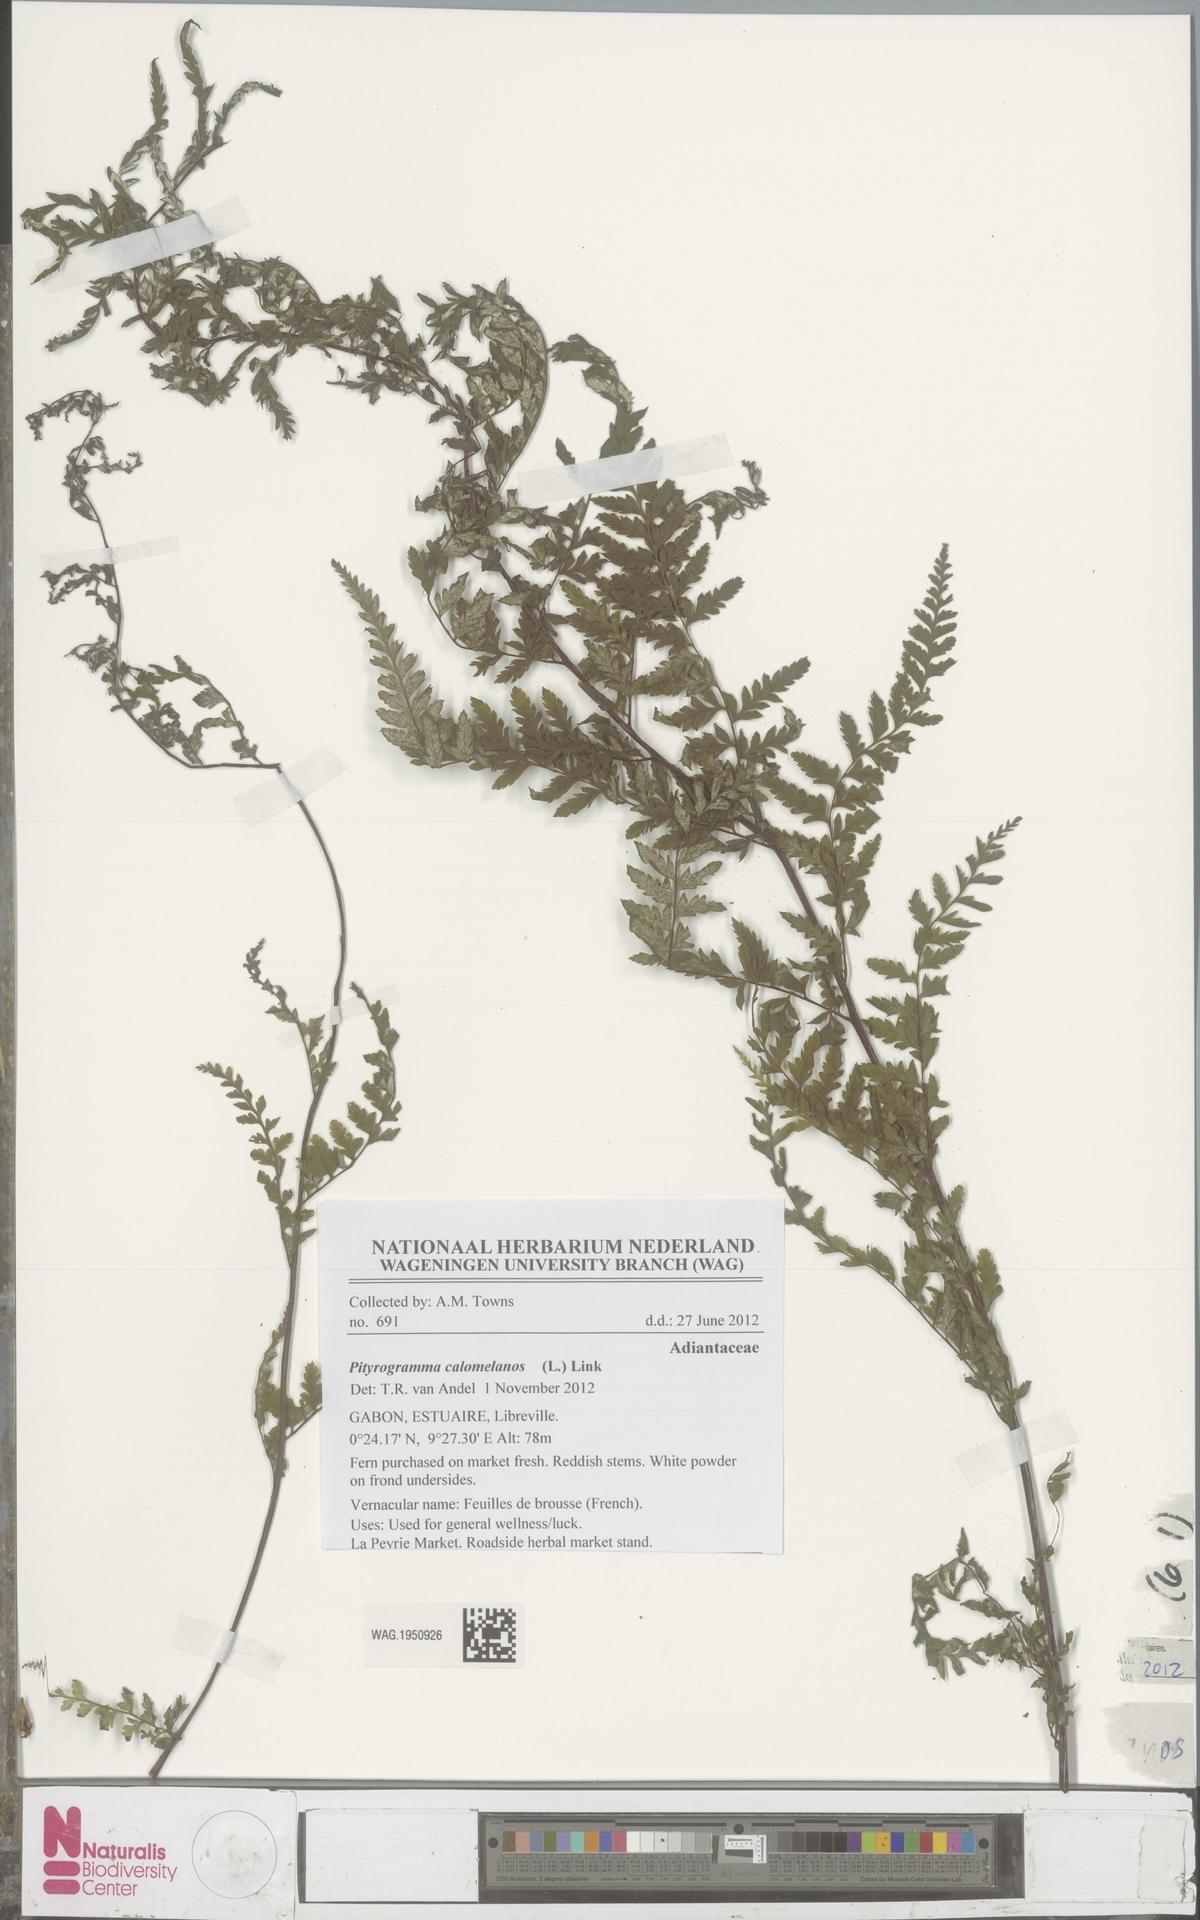 WAG.1950926   Pityrogramma calomelanos (L.) Link